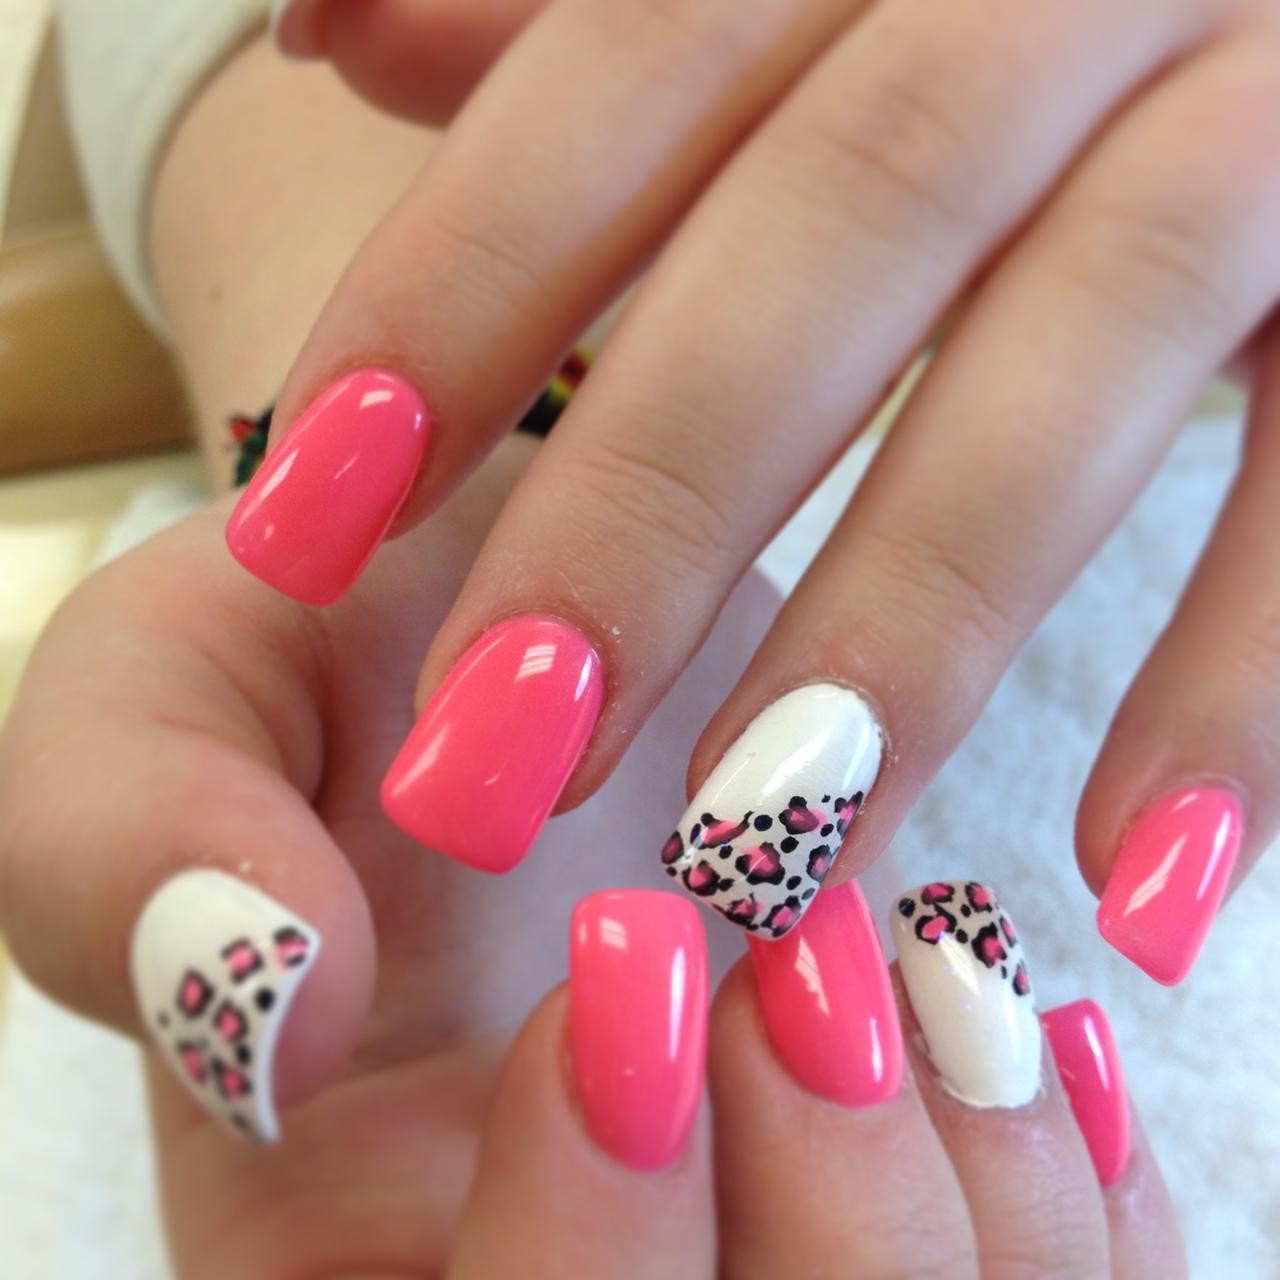 Nails Design Tumblr ~ Beautiful Nails And Color